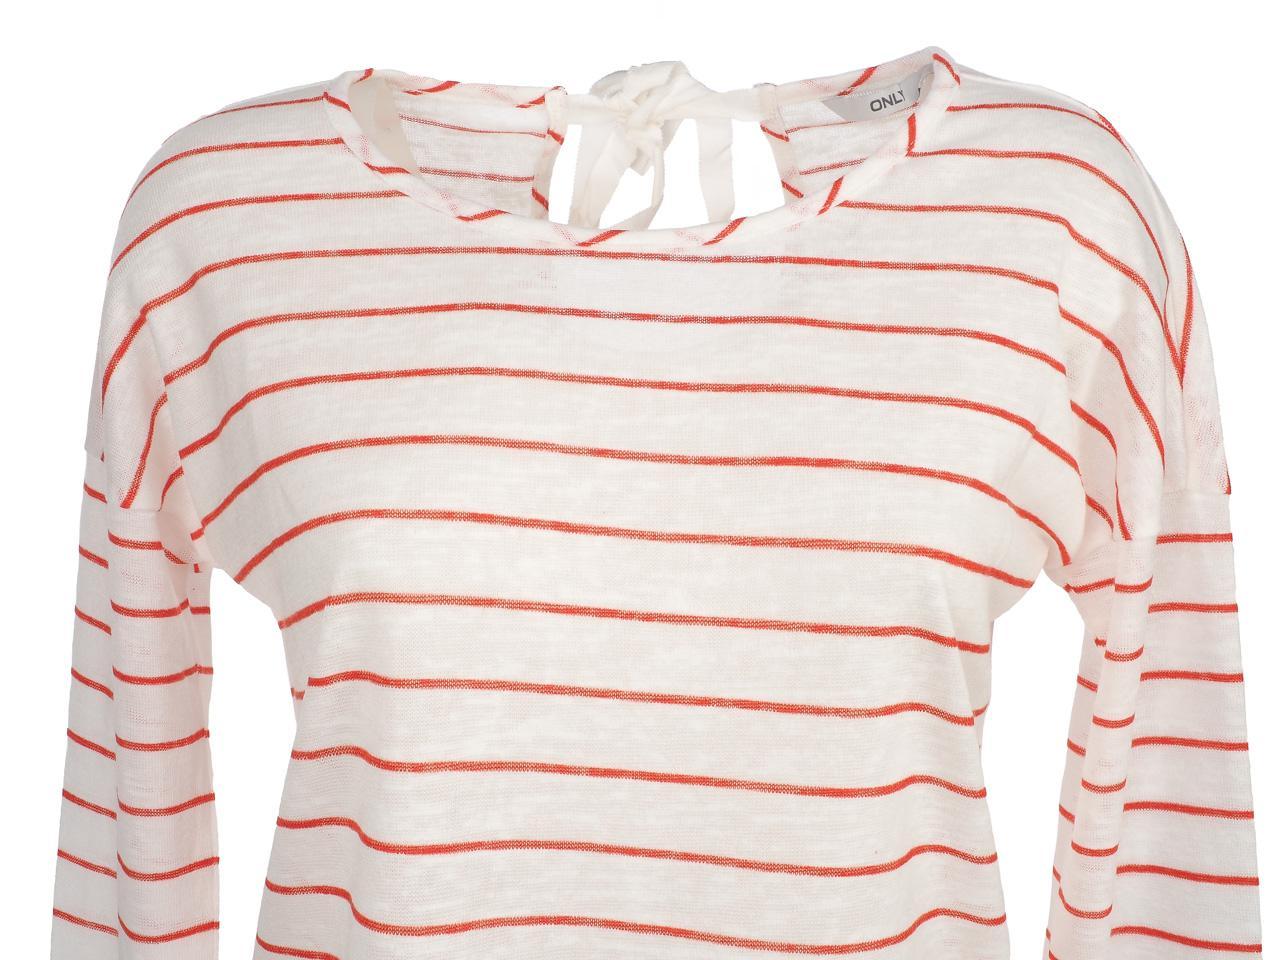 Tee-shirt-manches-longues-Only-Marina2-clouddancer-tee-l-Beige-54834-Neuf miniature 2